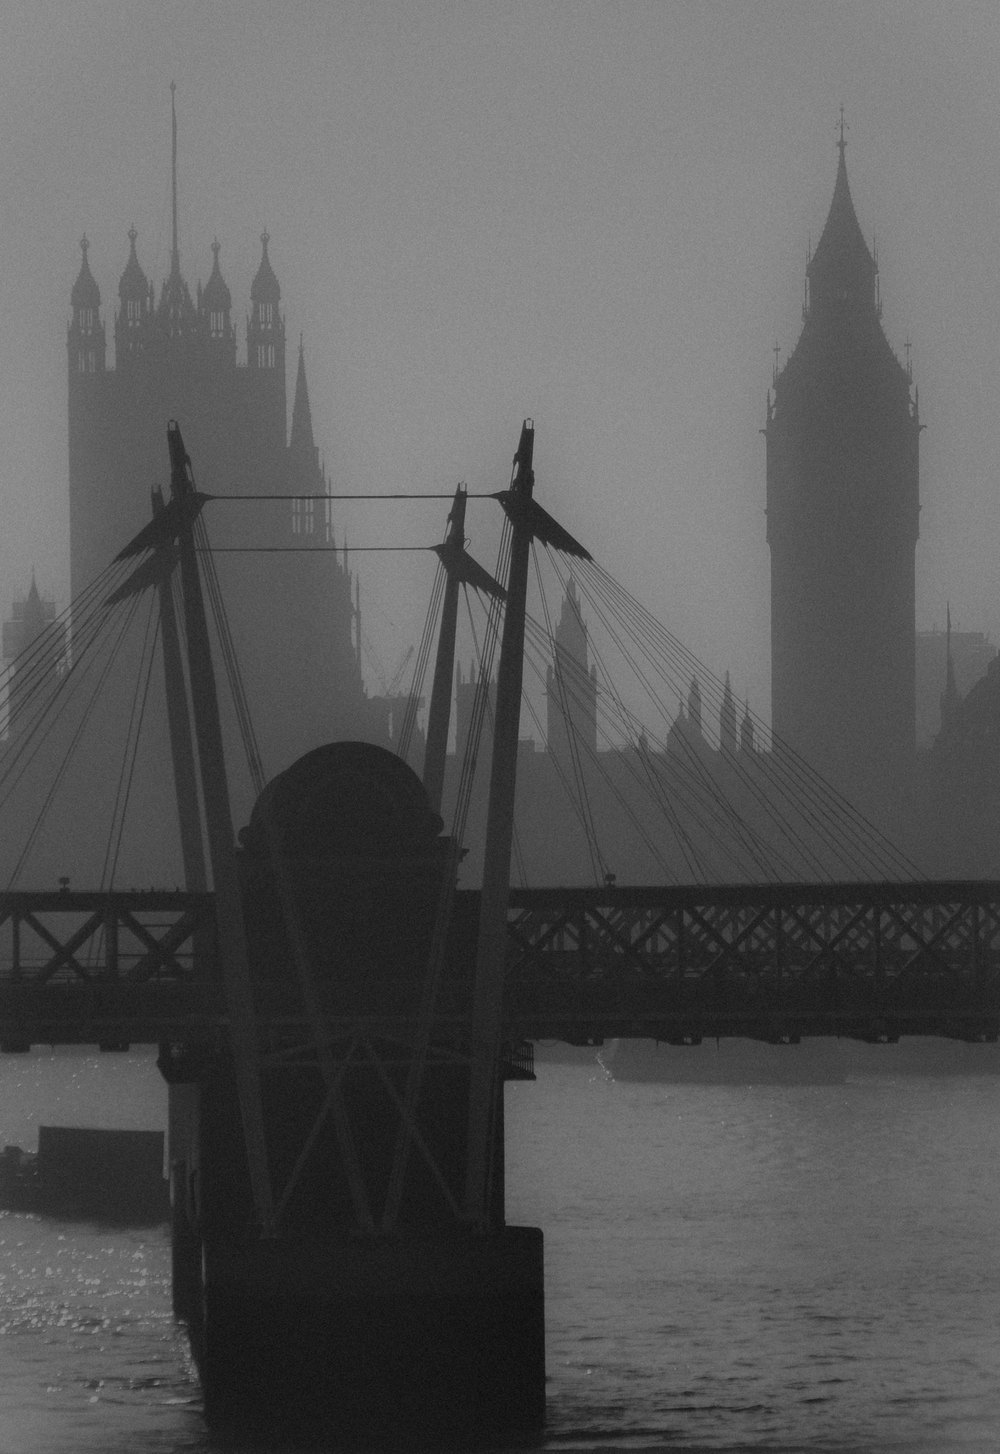 21st Century London